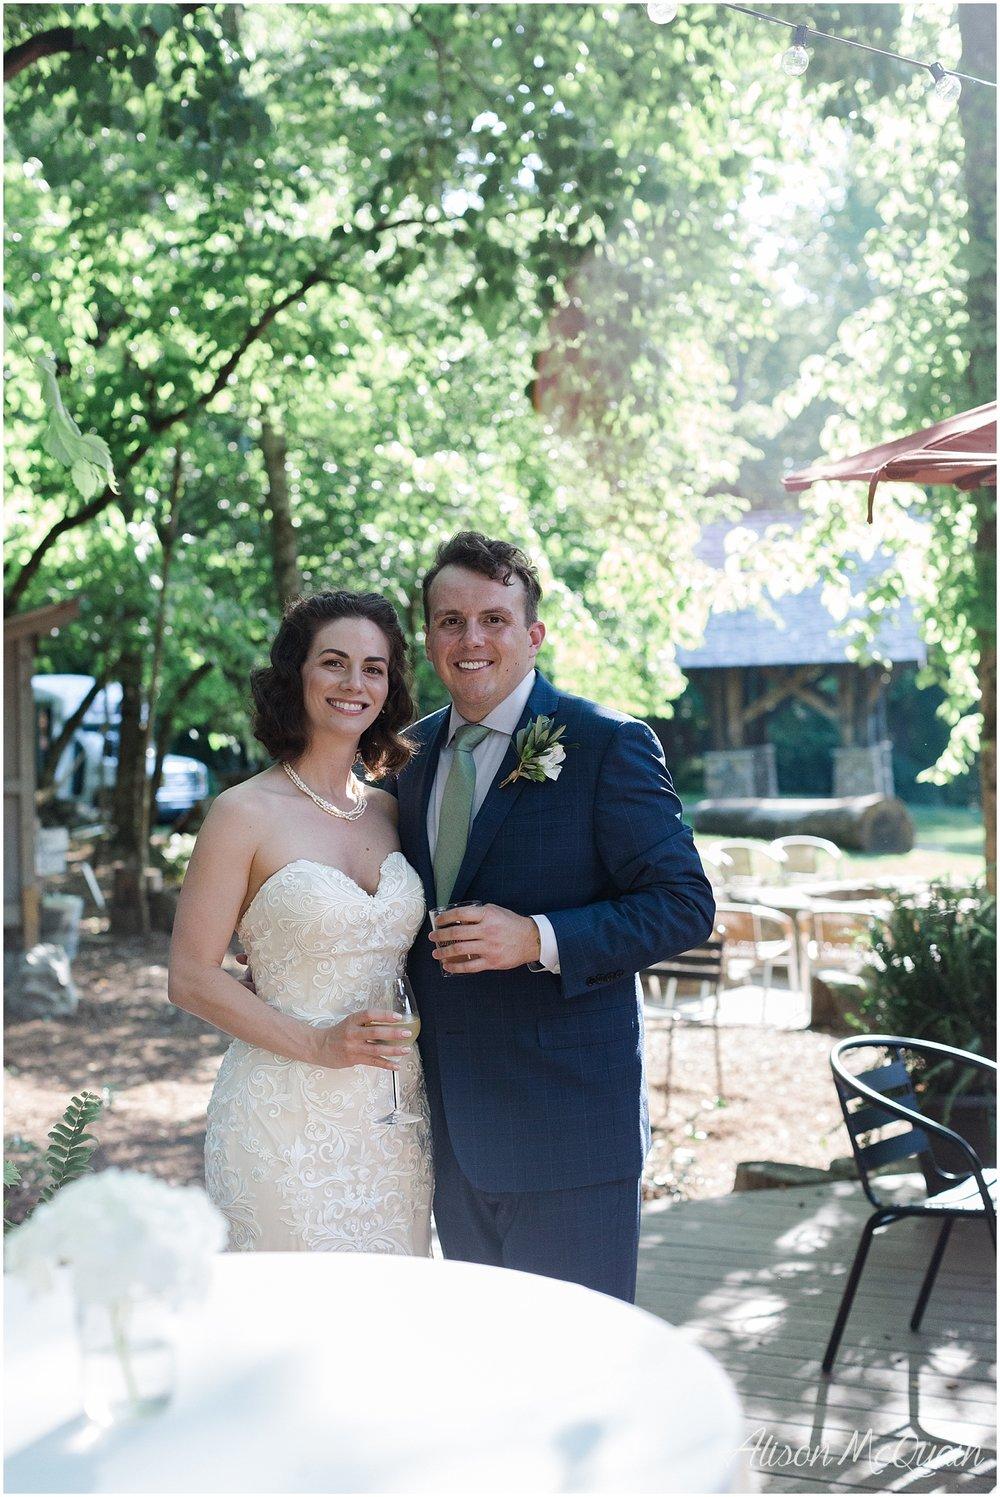 2018-05-23_0020LandC_wedding_dancingbearlodge_townsend_tn_amp.jpg